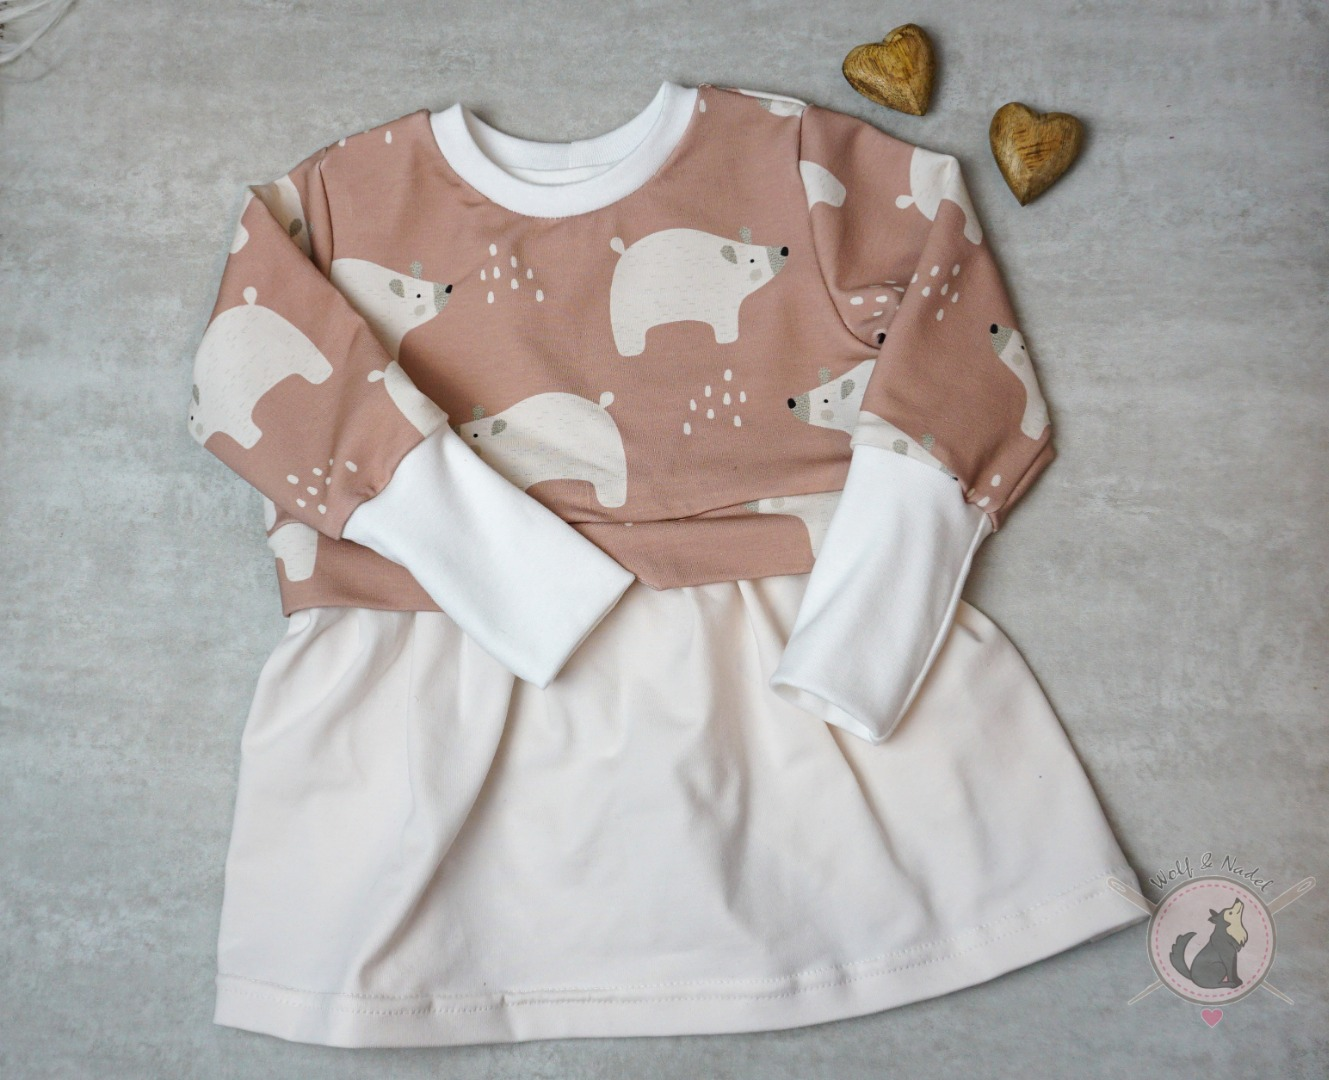 Sofortkauf Handmade Girlysweater Eisbär Gr 80